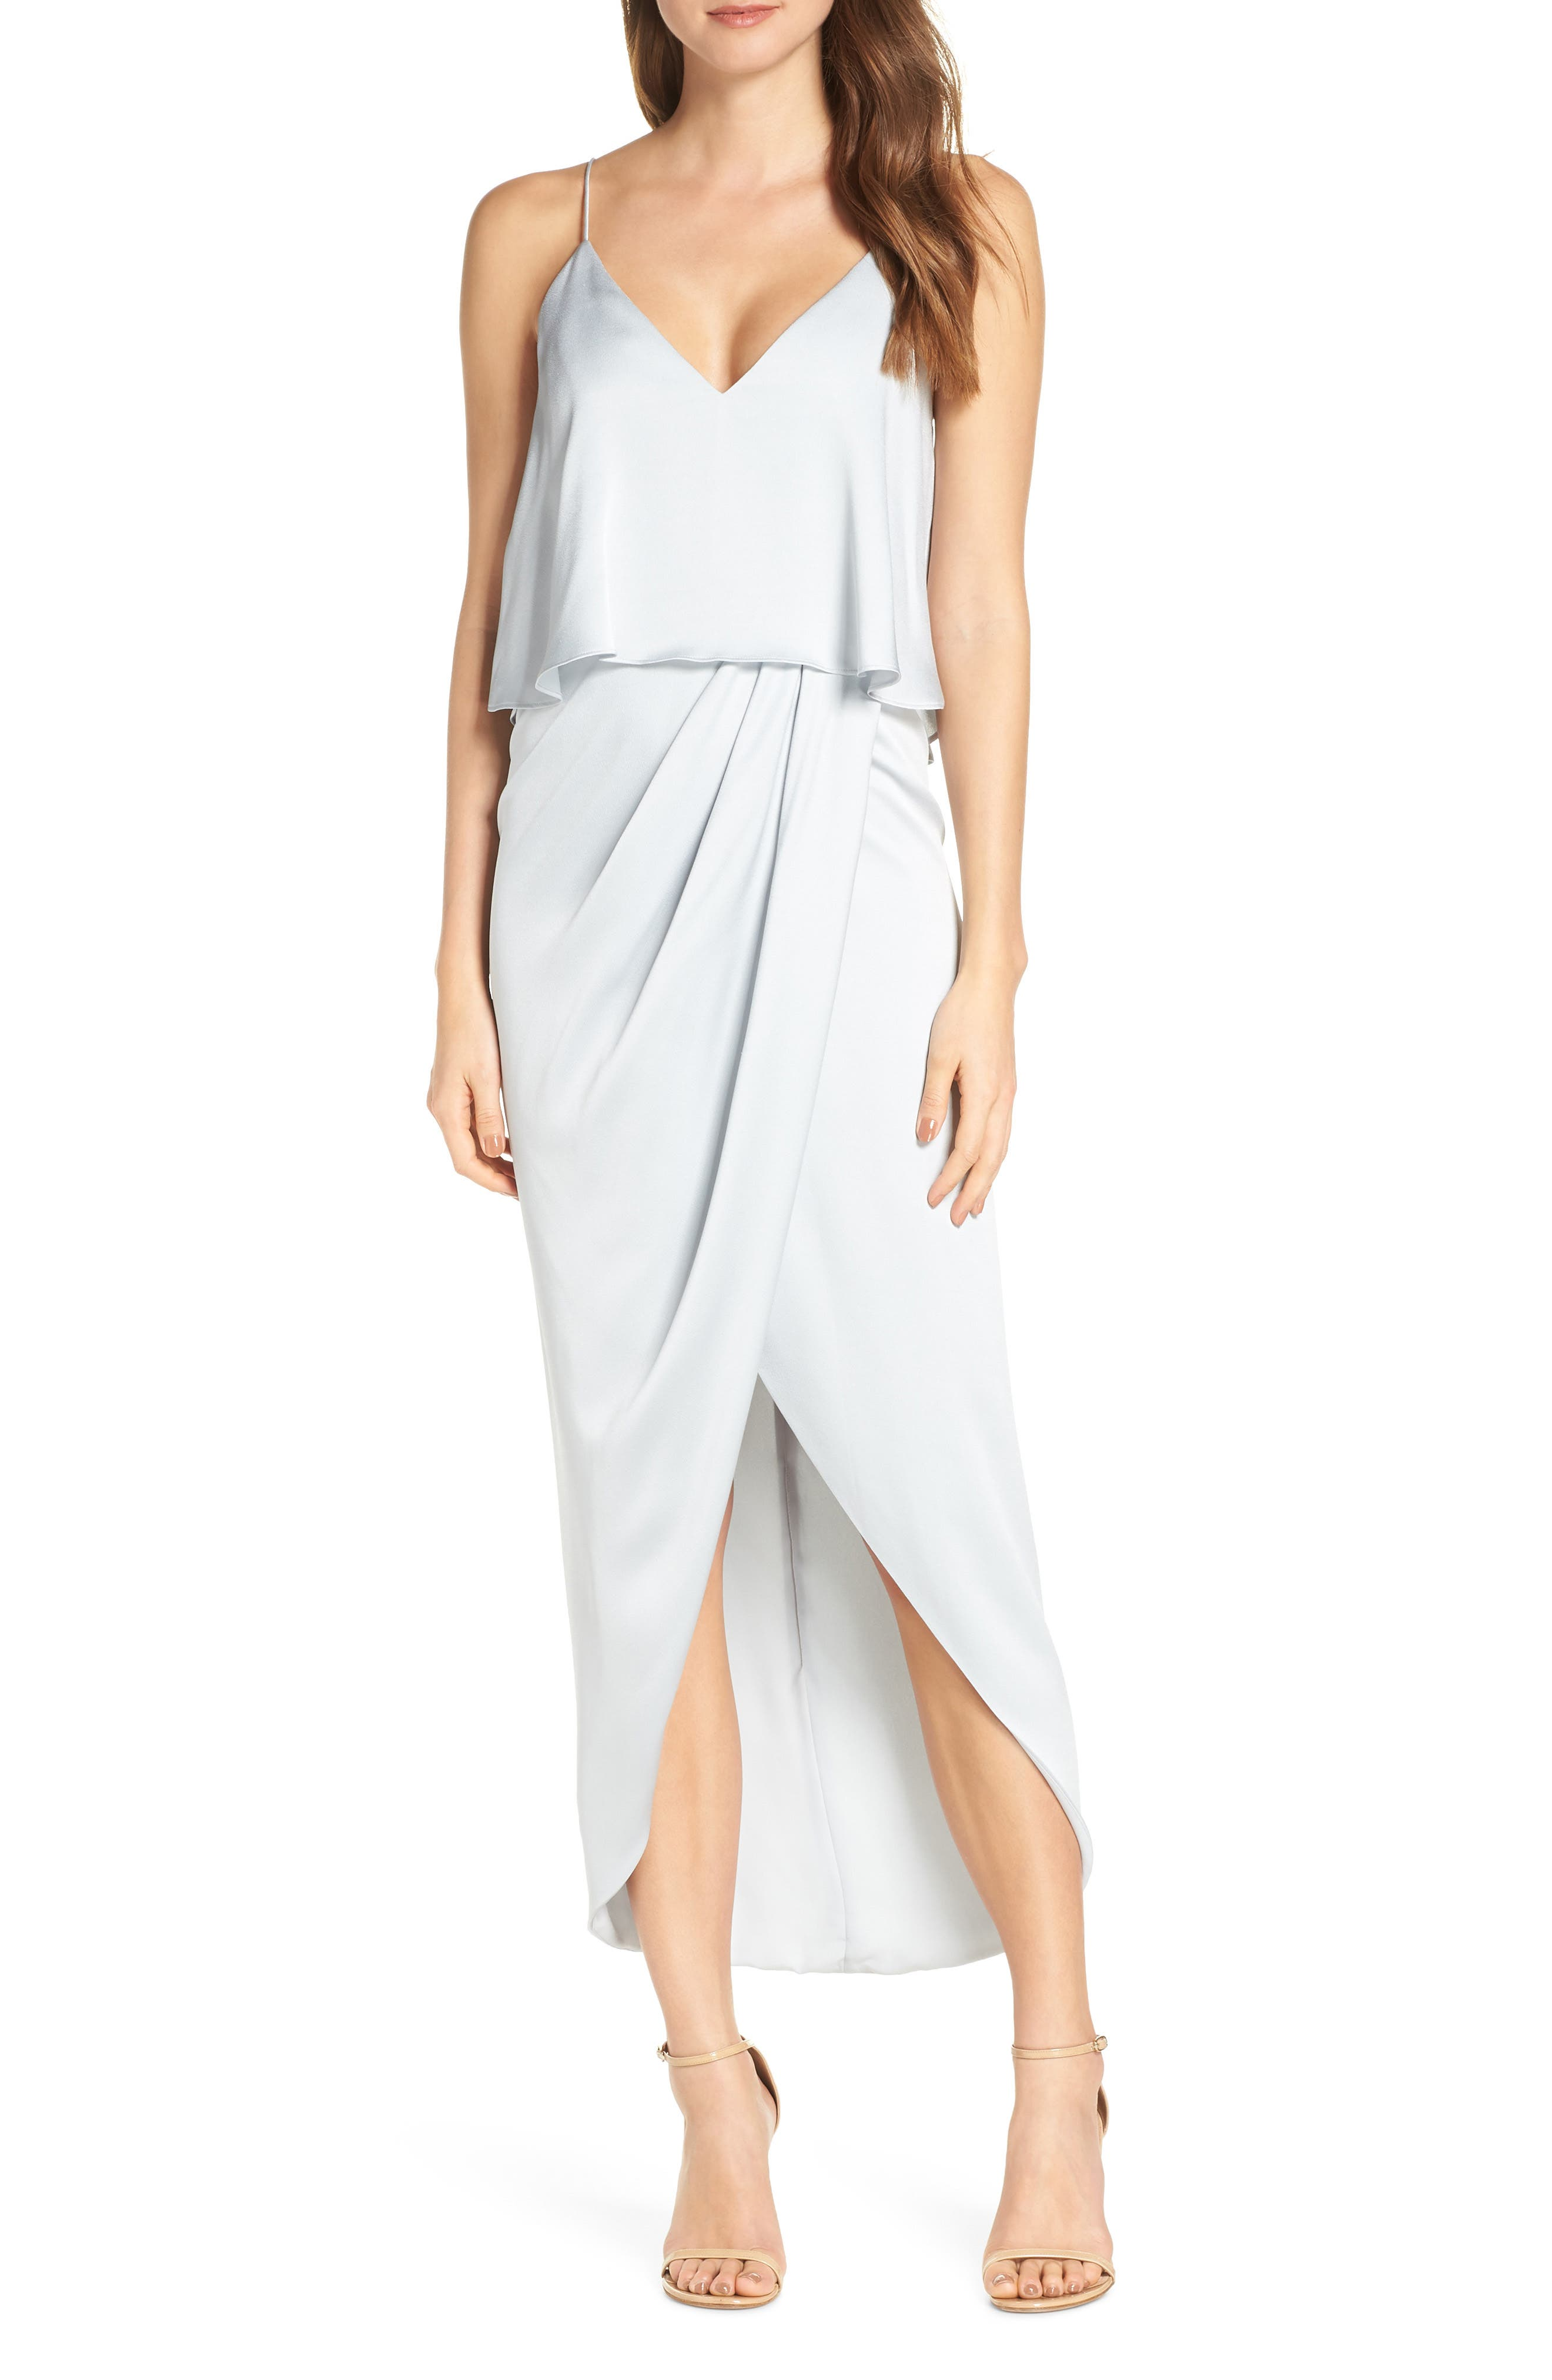 SHONA JOY, Luxe Frill Tulip Hem Maxi Dress, Main thumbnail 1, color, CLOUD